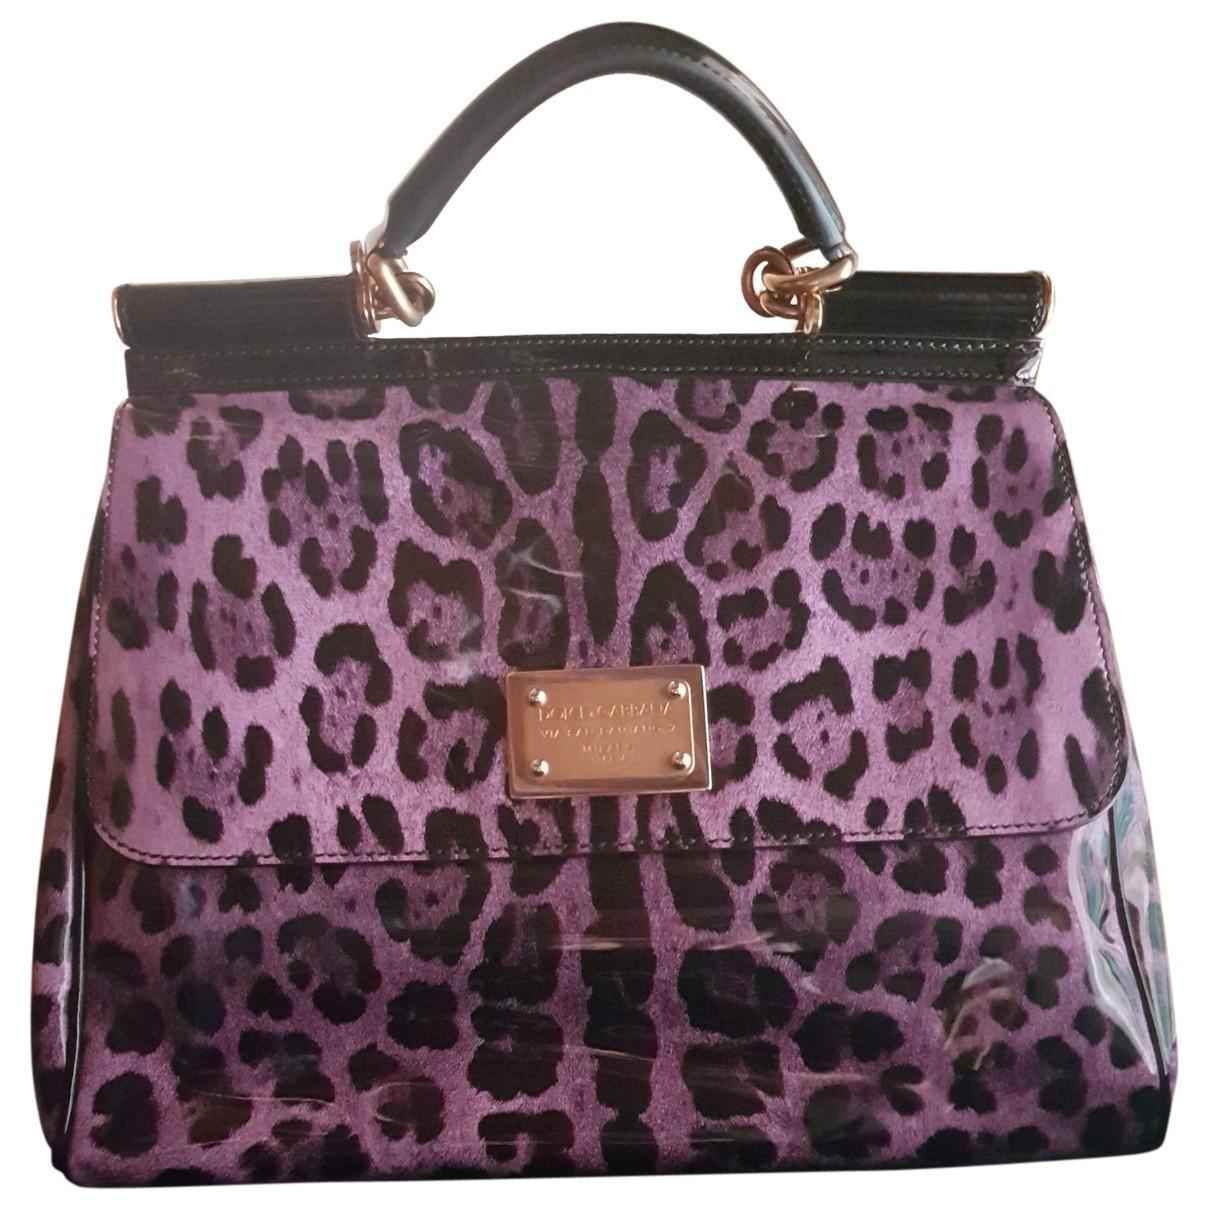 Dolce & Gabbana Sicily 62 Multicolour Patent leather handbag for Women \N